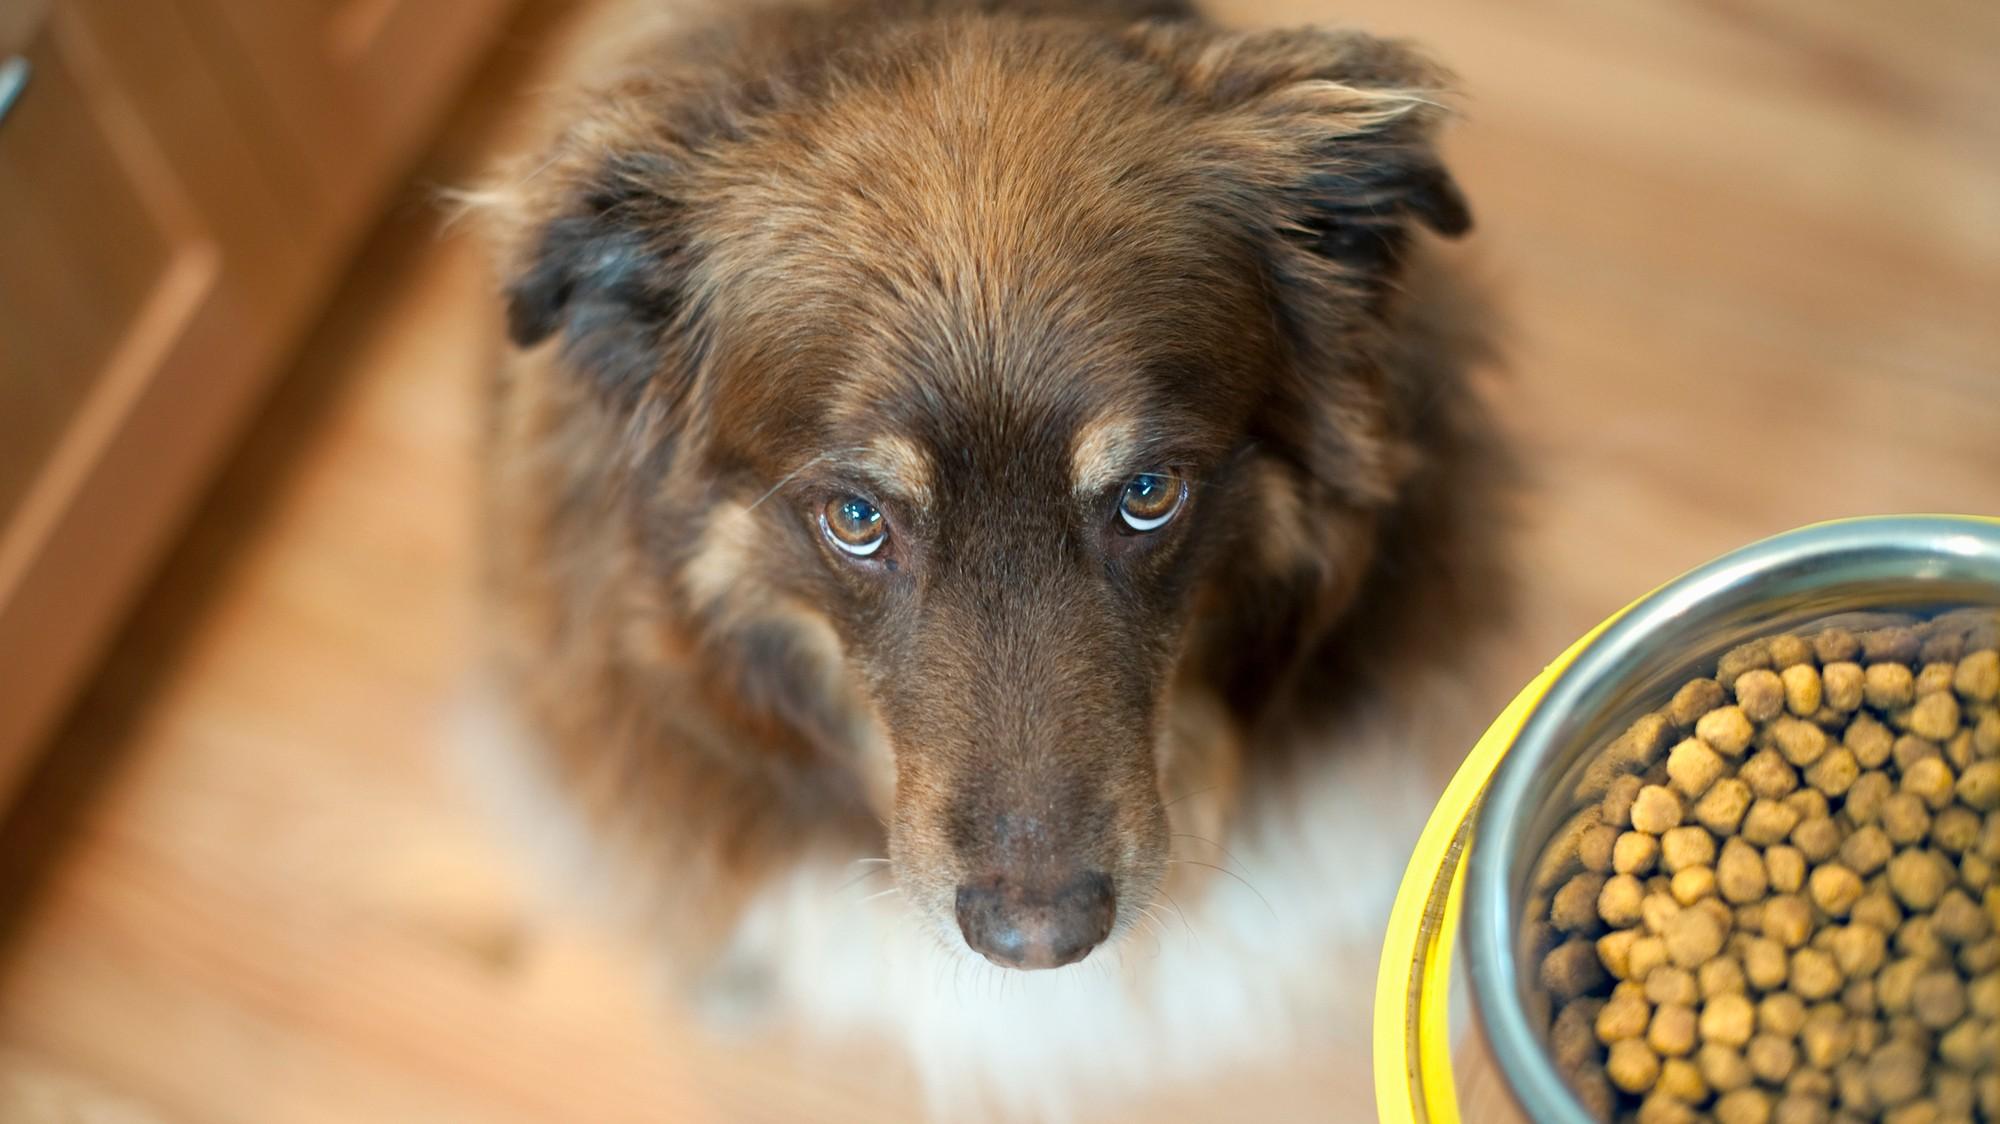 What Happens When a Human Eats Pet Food? - VICE